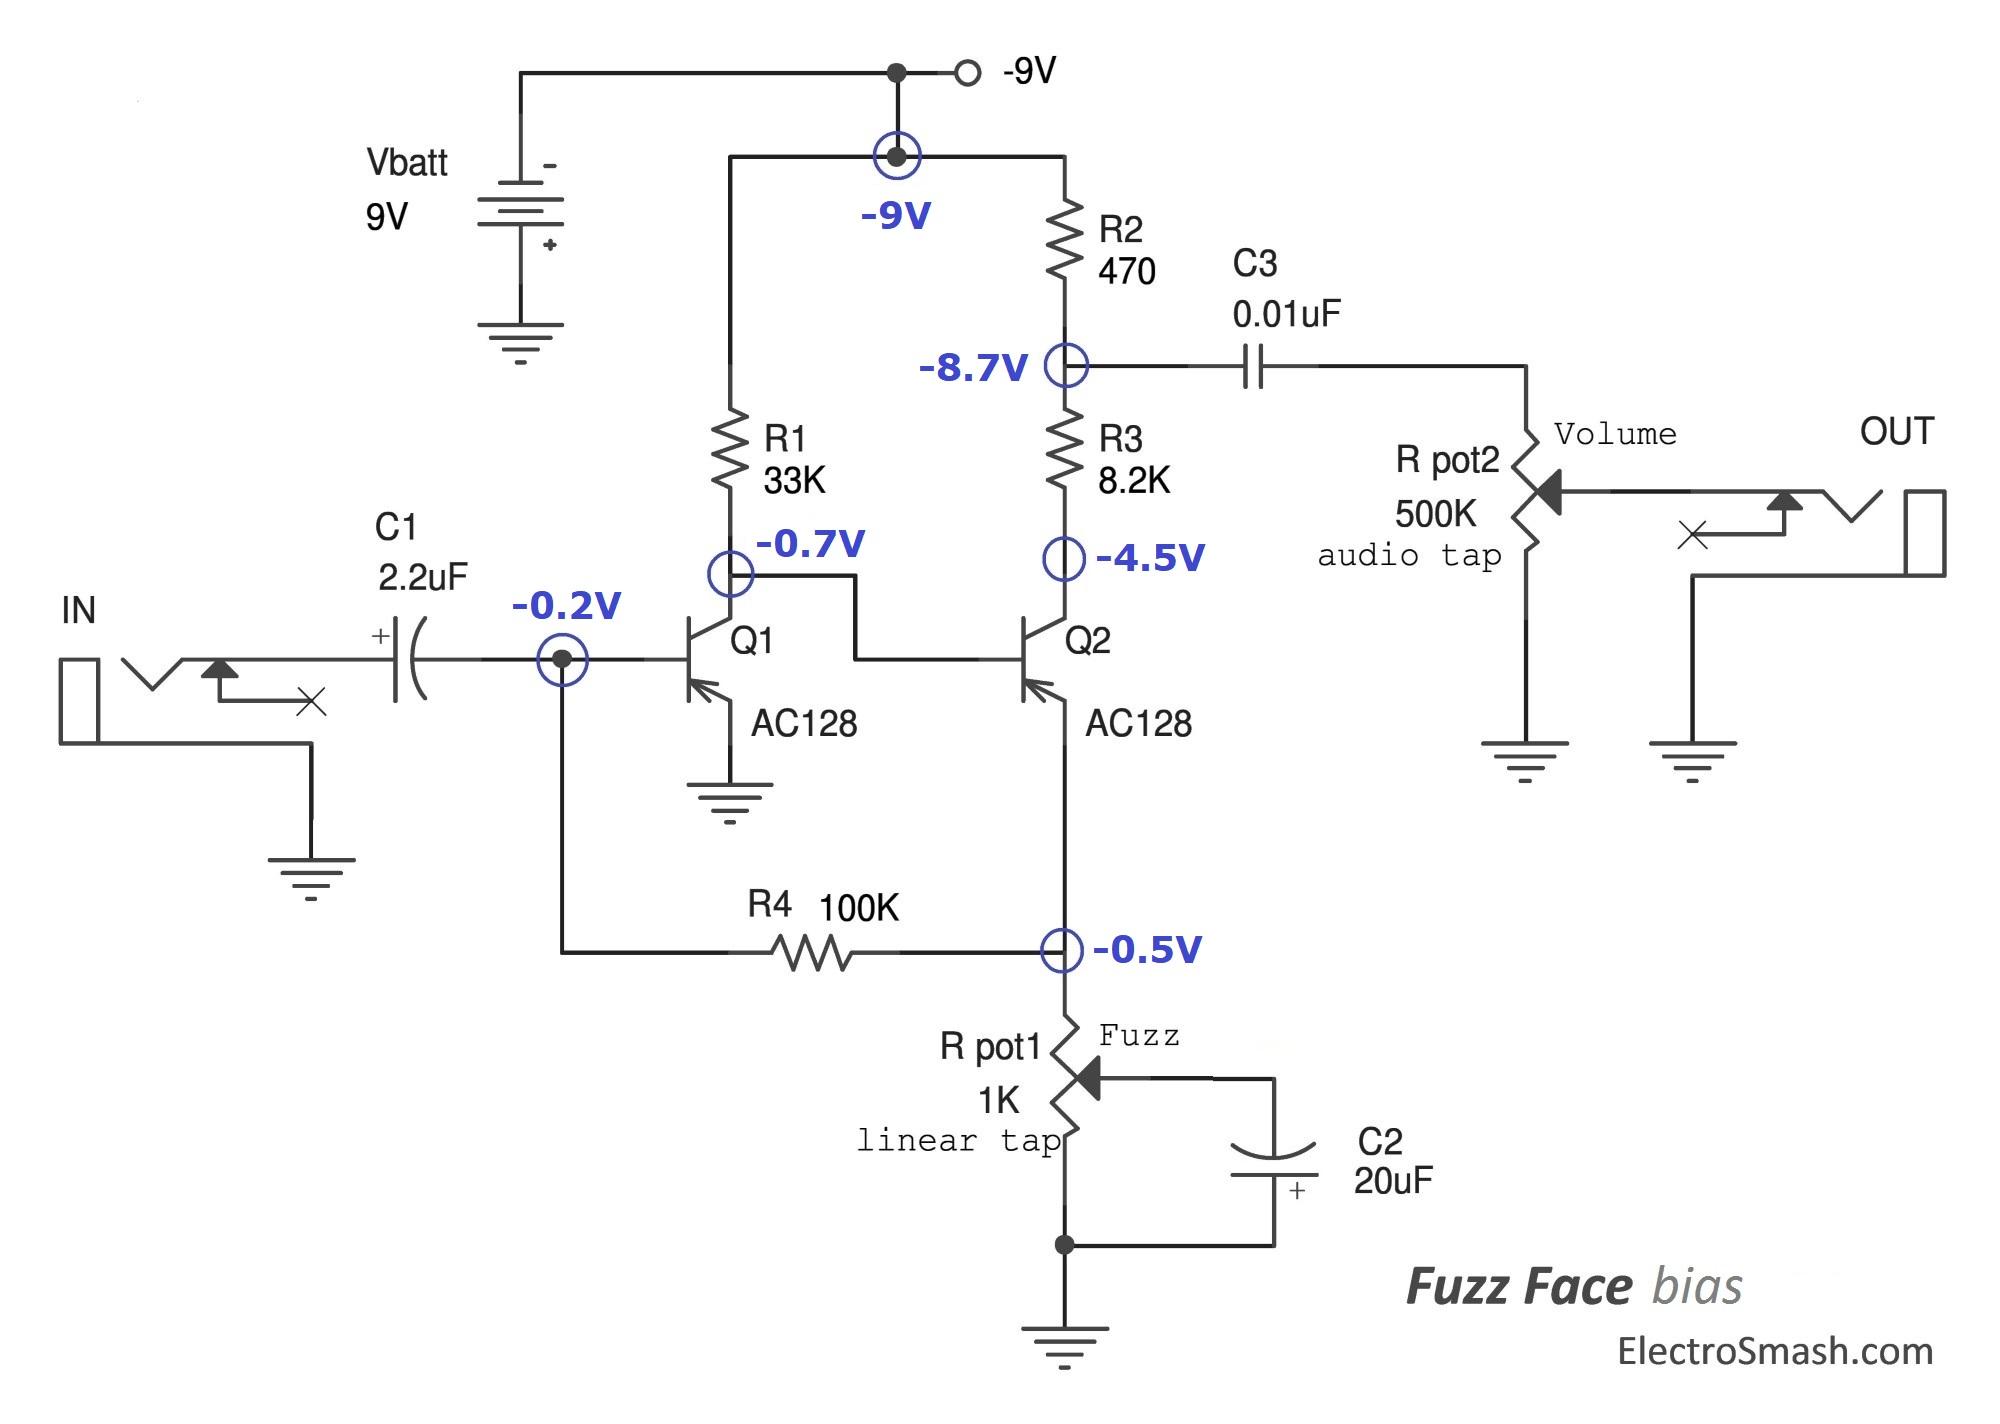 fuzz face wiring diagram composite volcano labeled electrosmash analysis